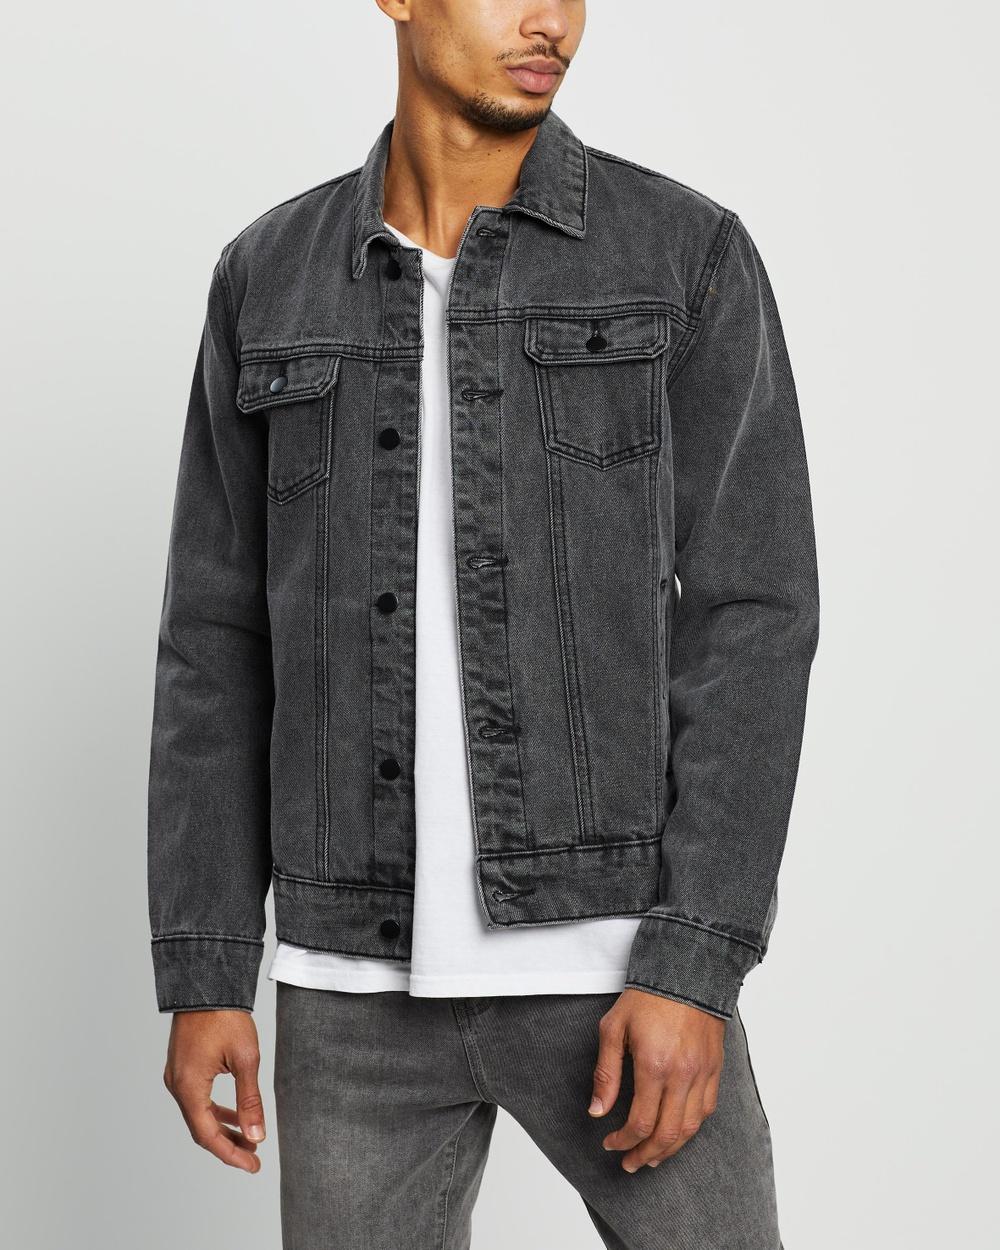 Staple Superior Denim Trucker Jacket jacket Black Australia